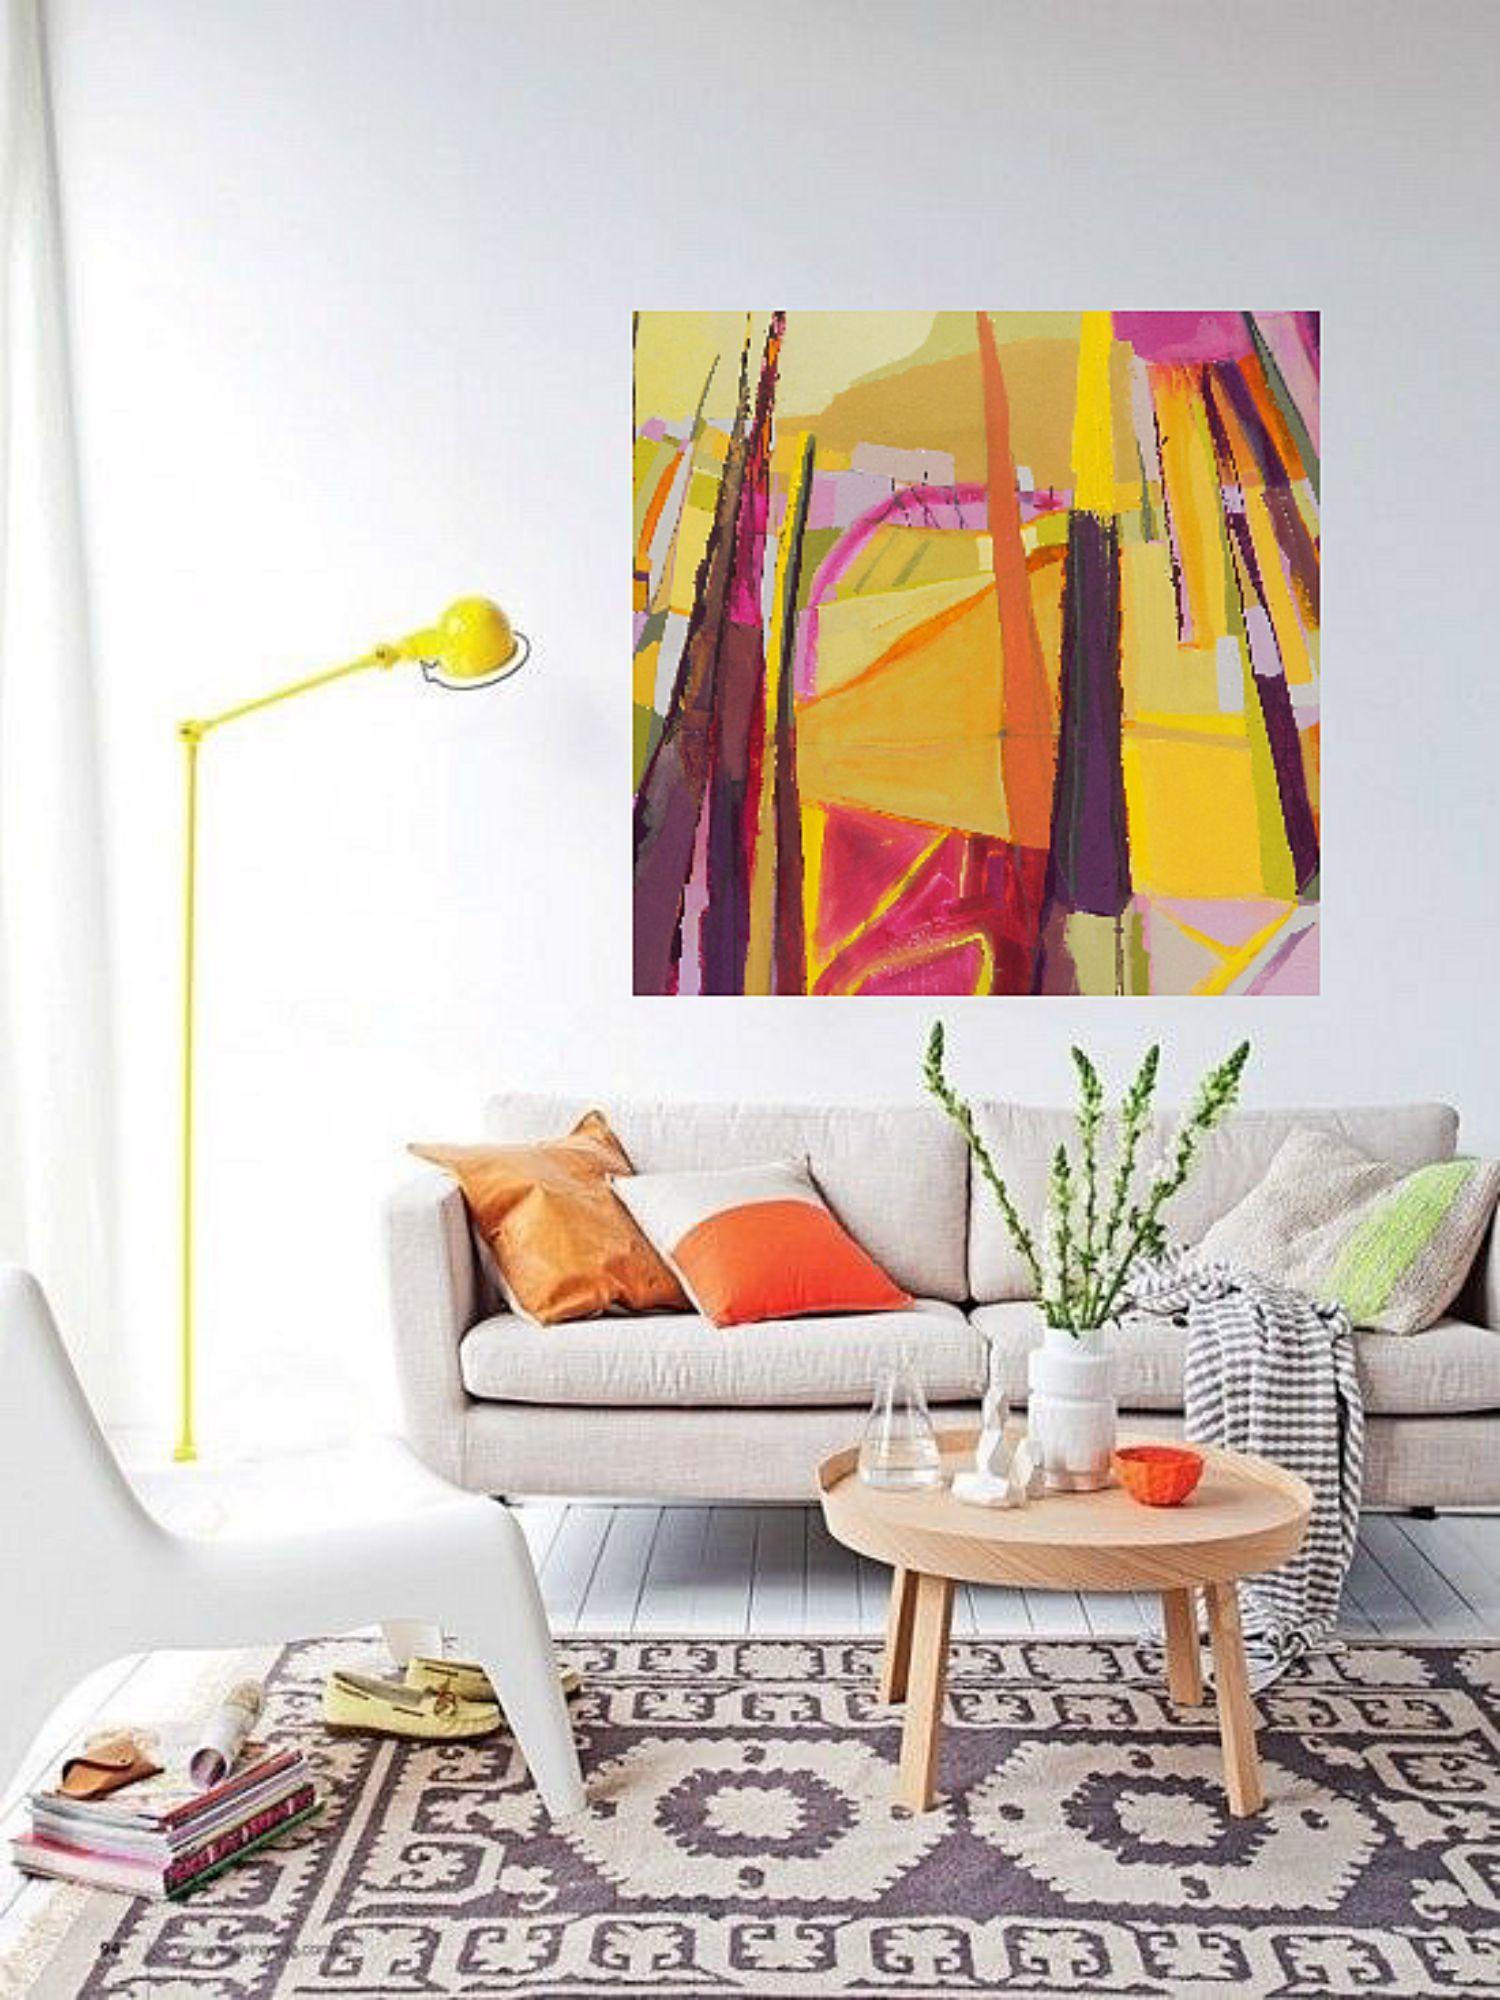 Mooie lichte woonkamer met kleur! ★ #studiovanhuis